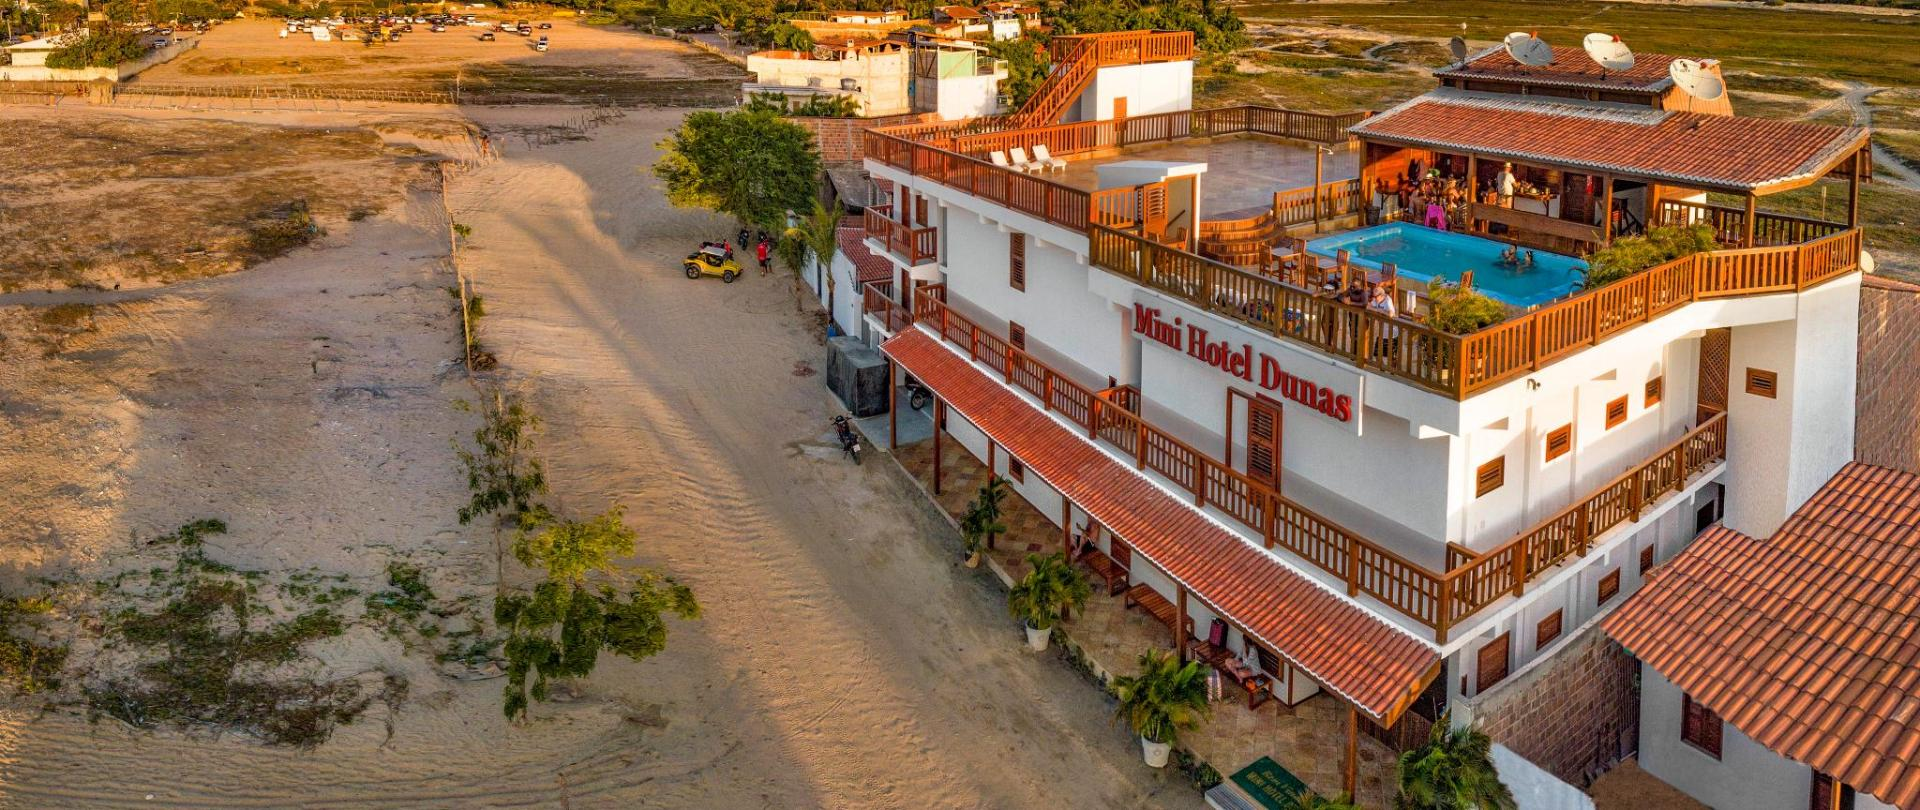 mini_hotel_dunas_003_panoramica.jpg